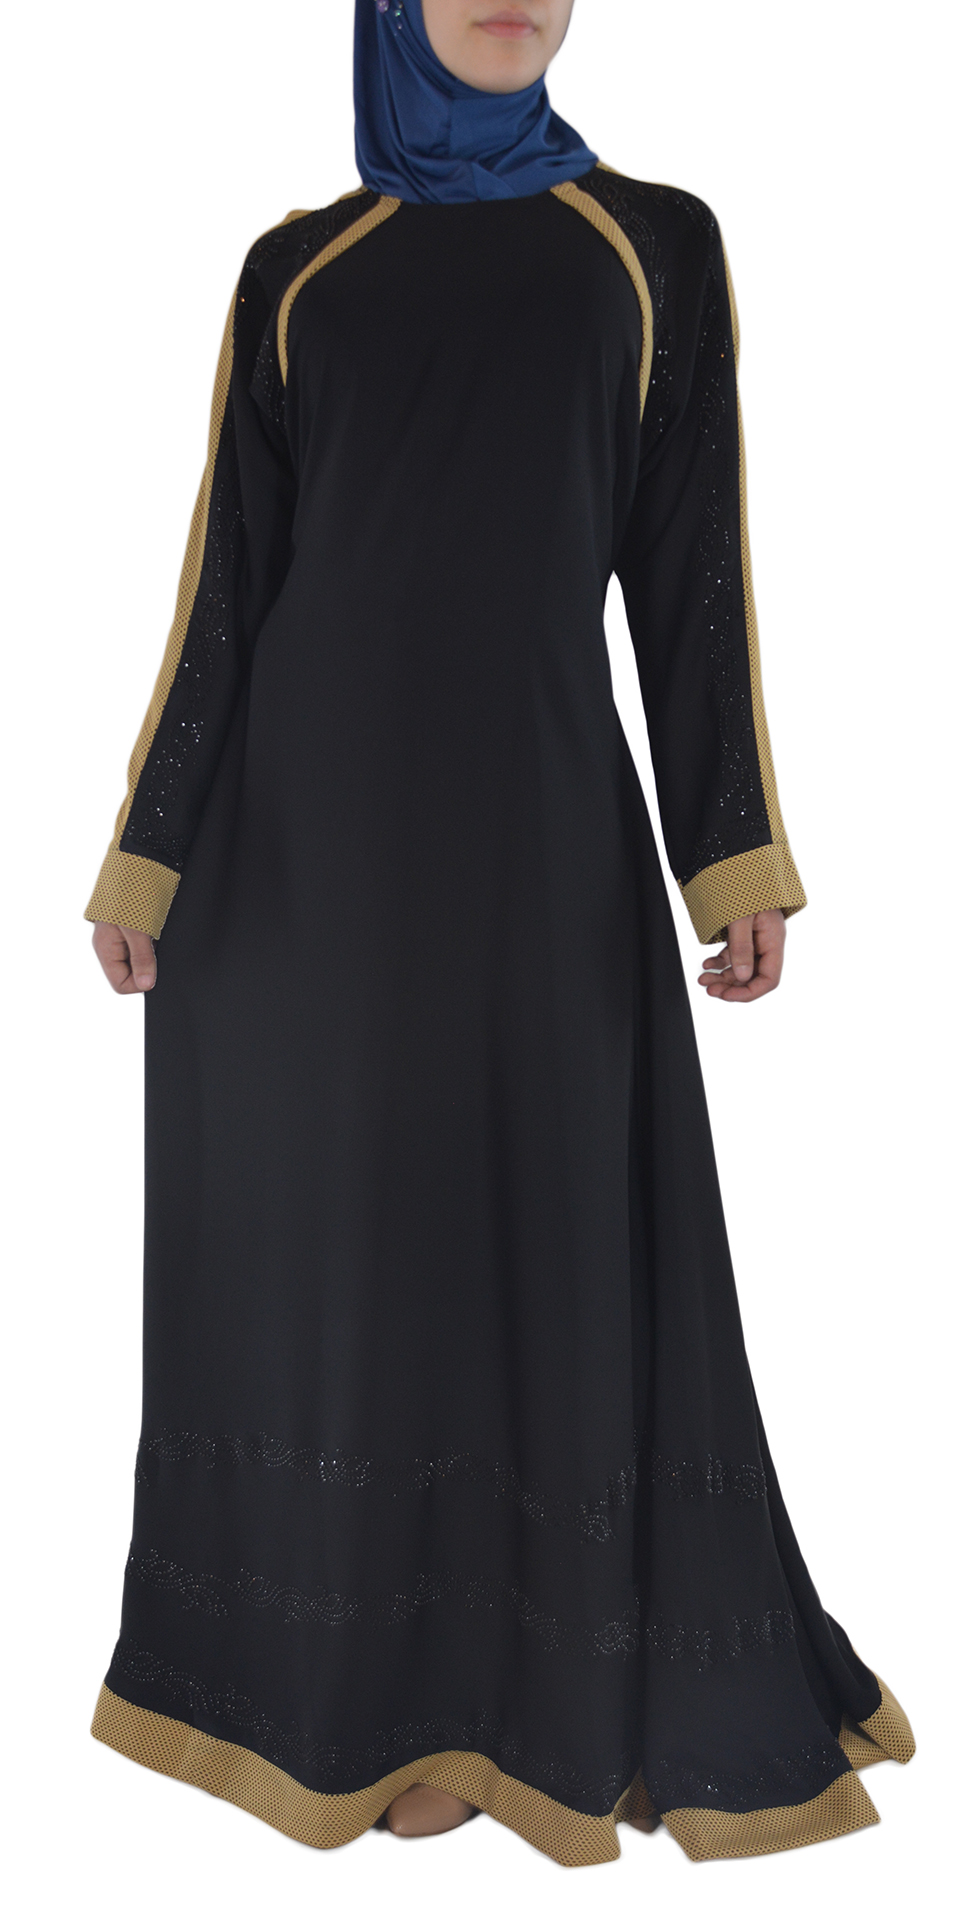 Shirin - Black and Tan Abaya Spread